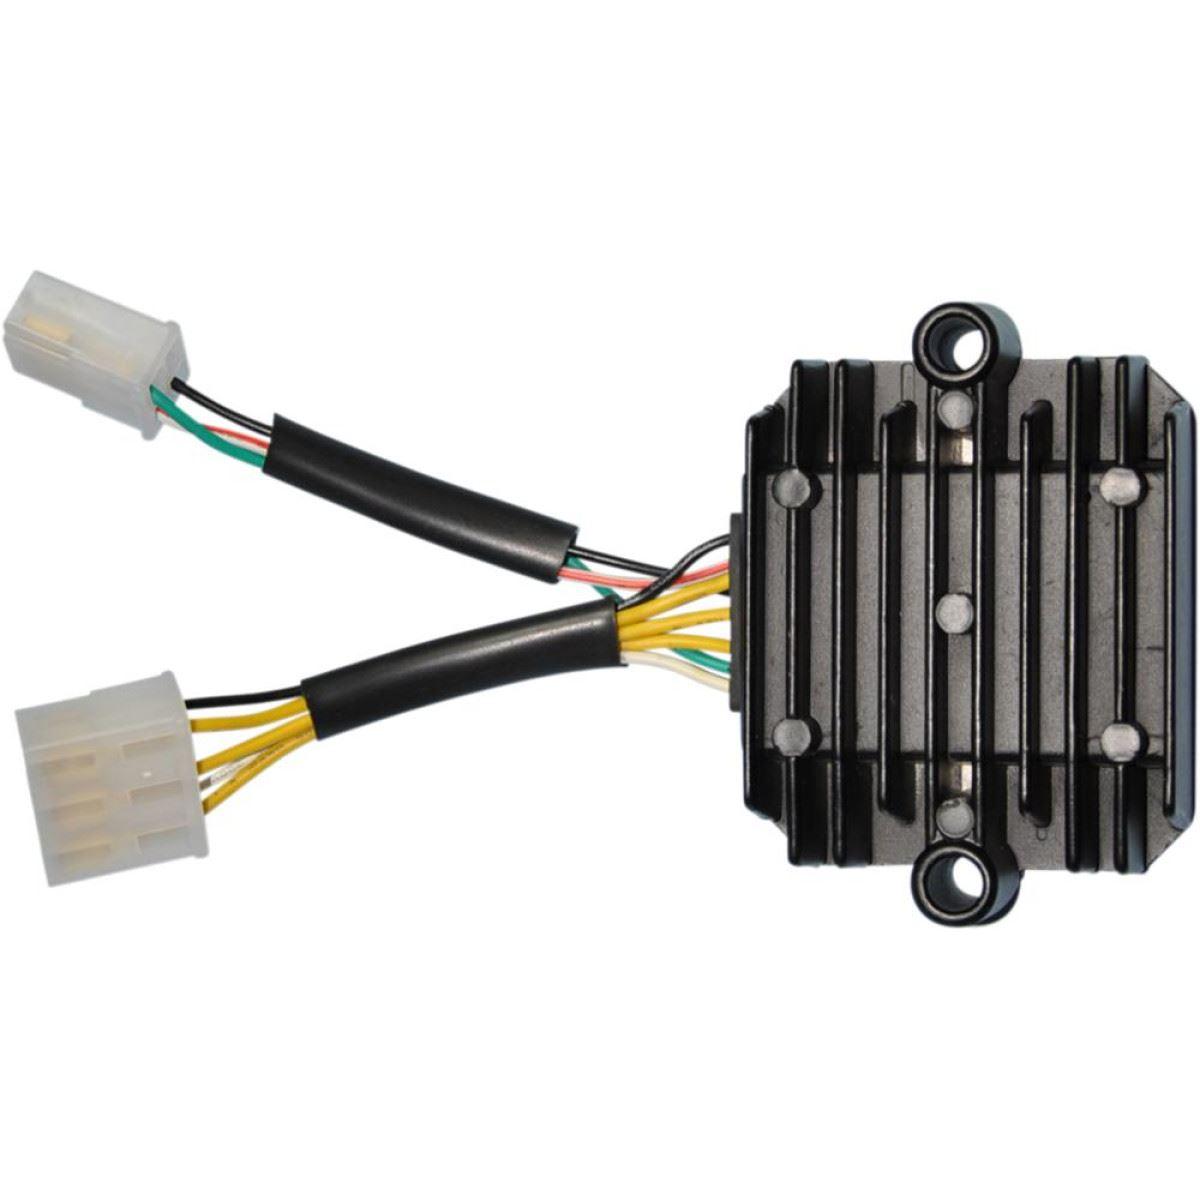 Voltage Regulator Rectifier 31600-426-000 For Honda CB650 Nighthawk 650 1982 UE